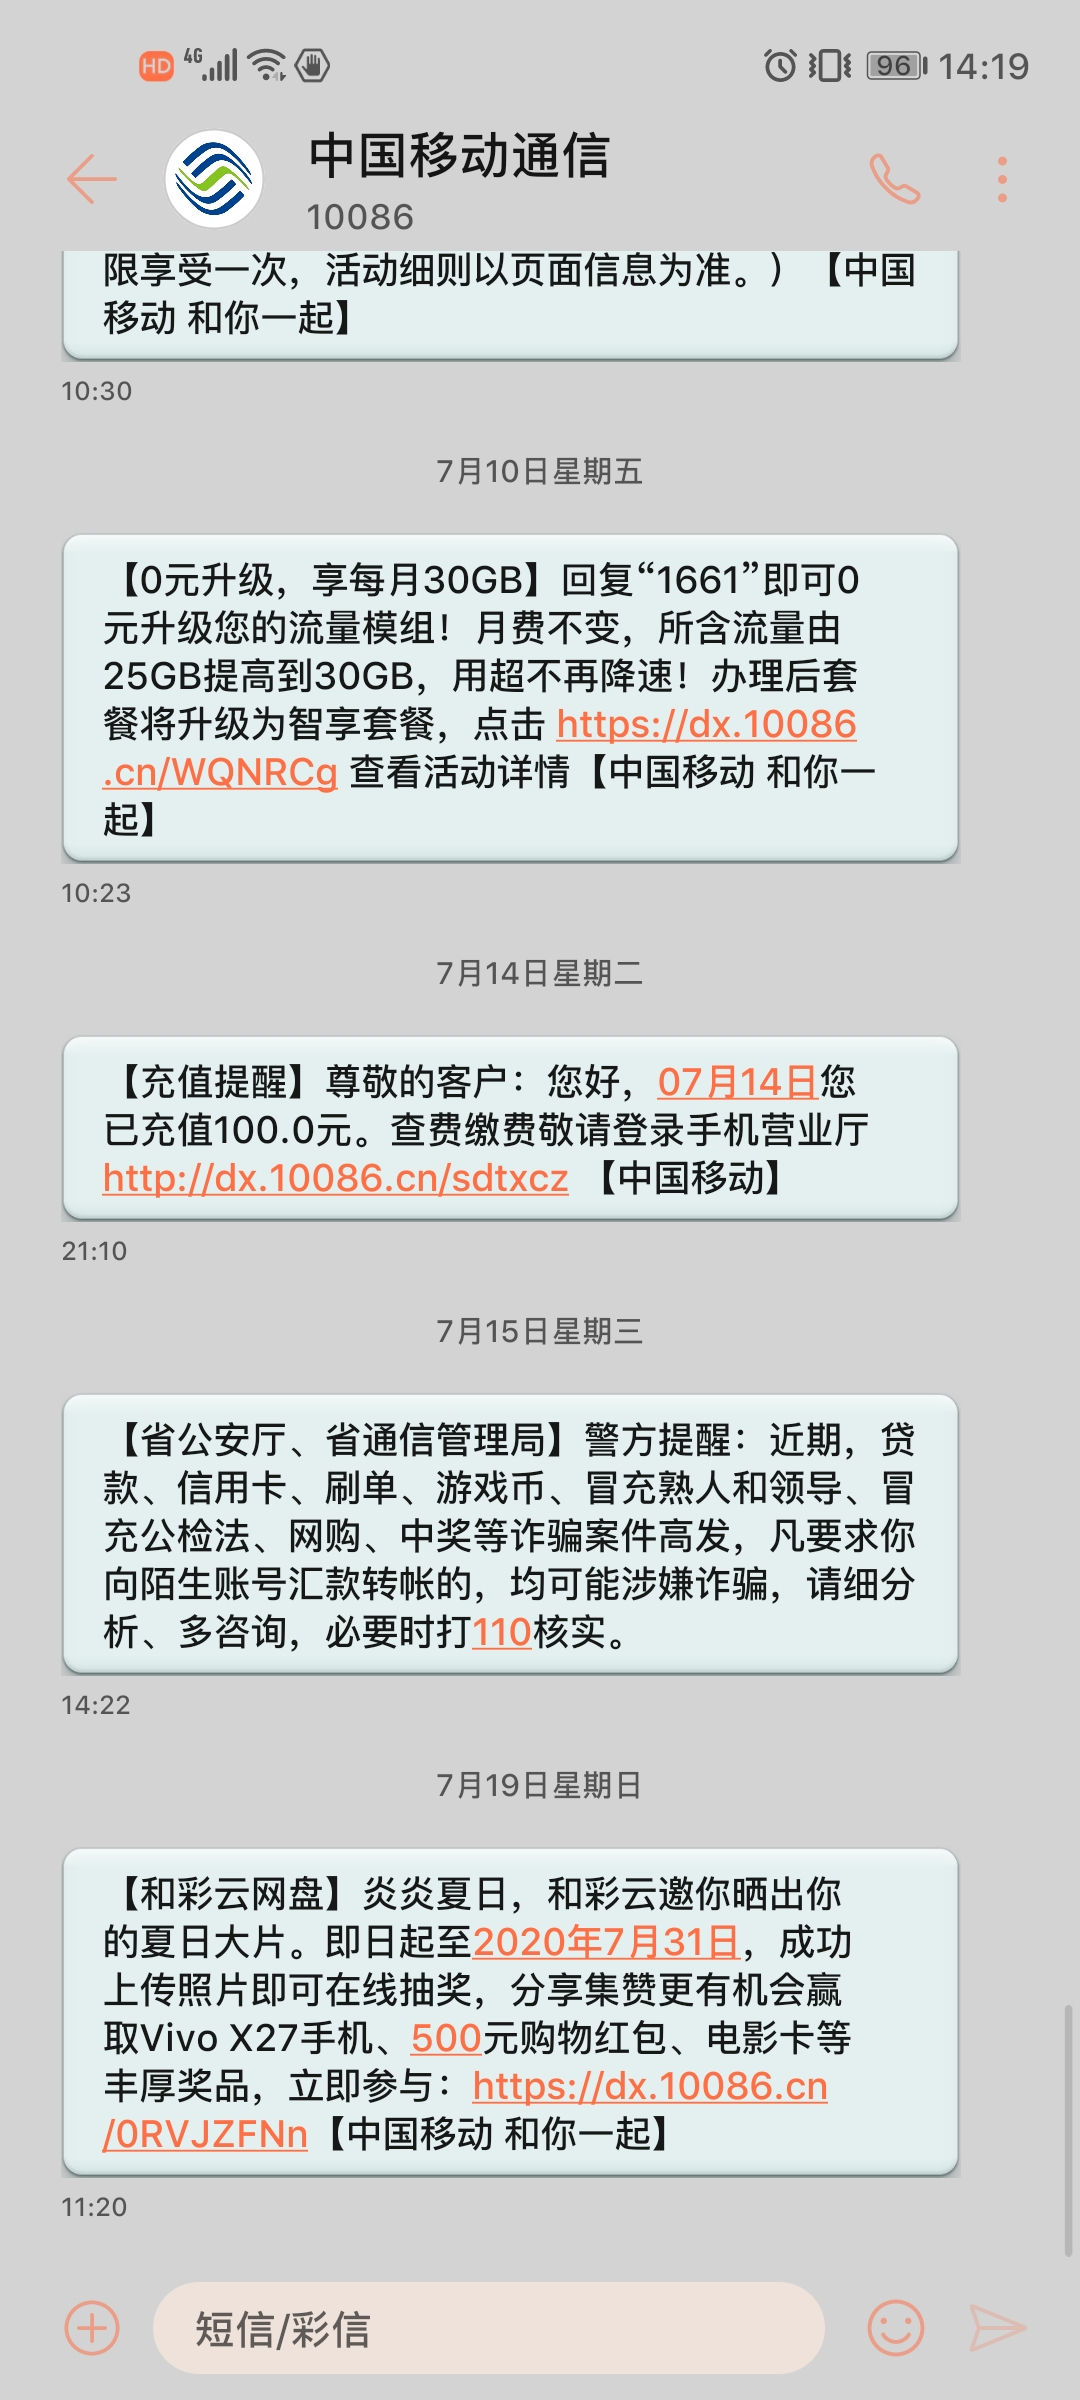 Screenshot_20200728_141920_com.android.mms.jpg